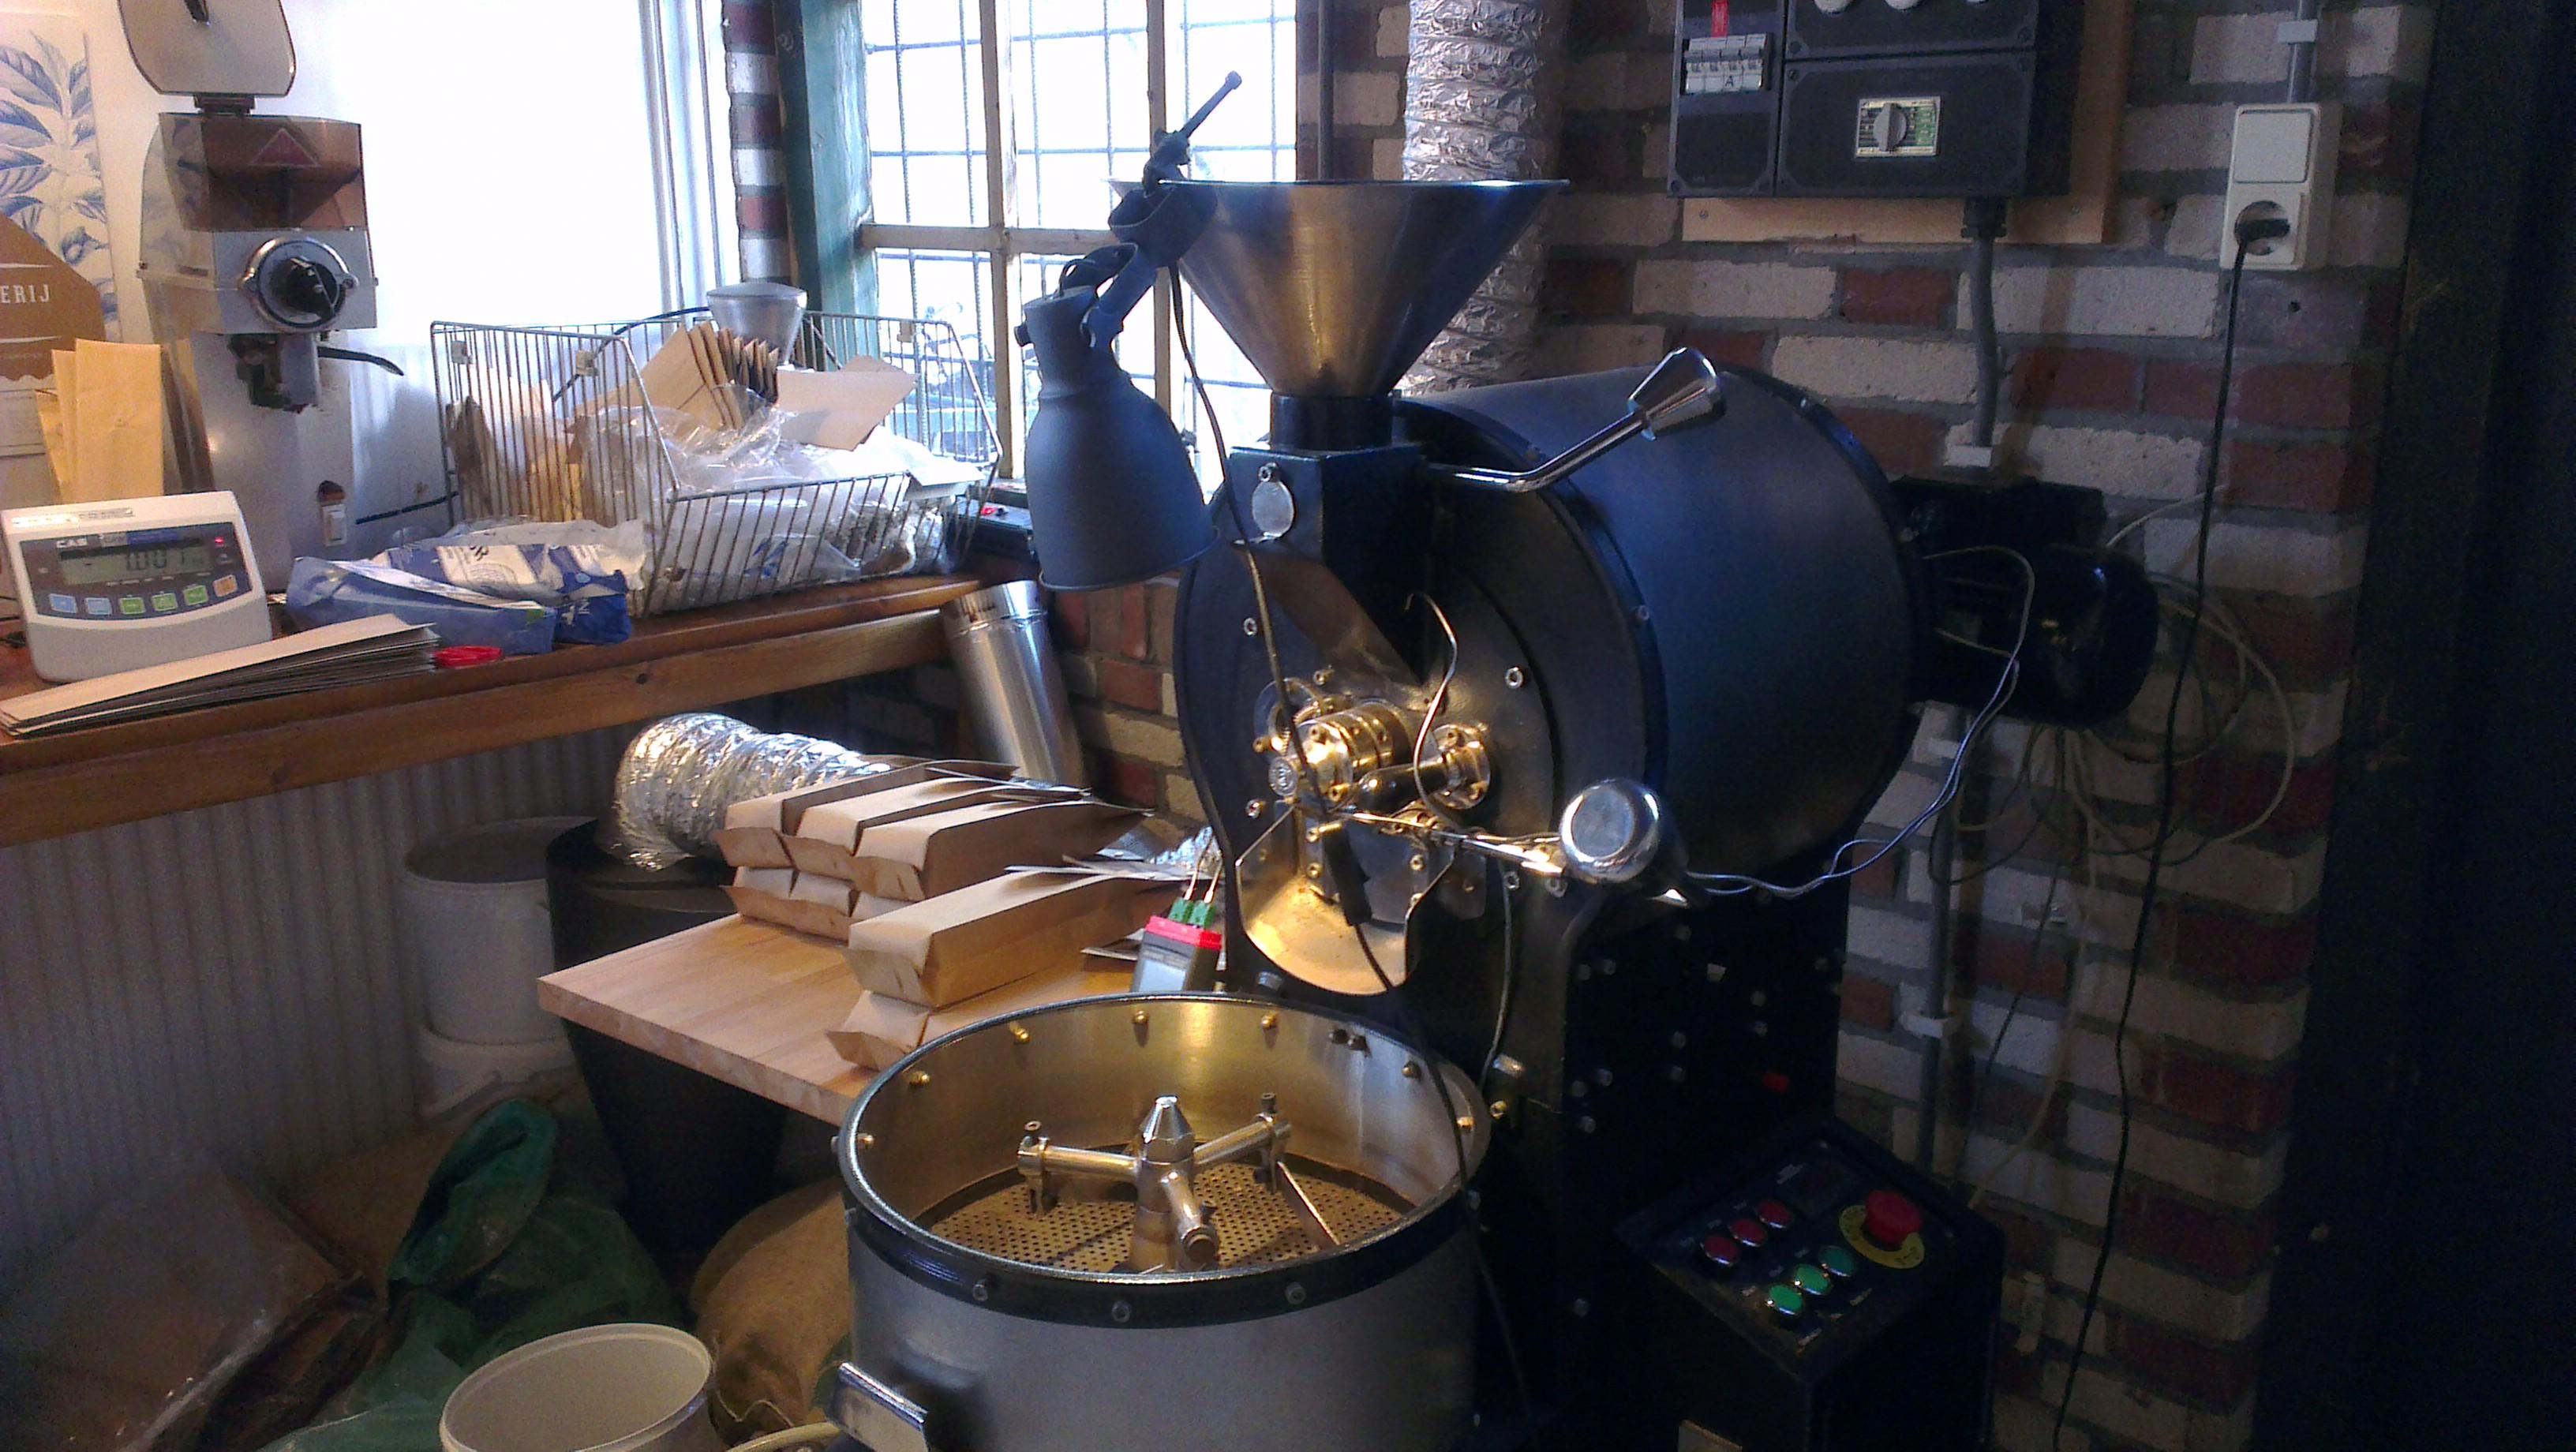 Stadsbranderij Eindhoven - Daily Cappuccino - Lifestyle Blog